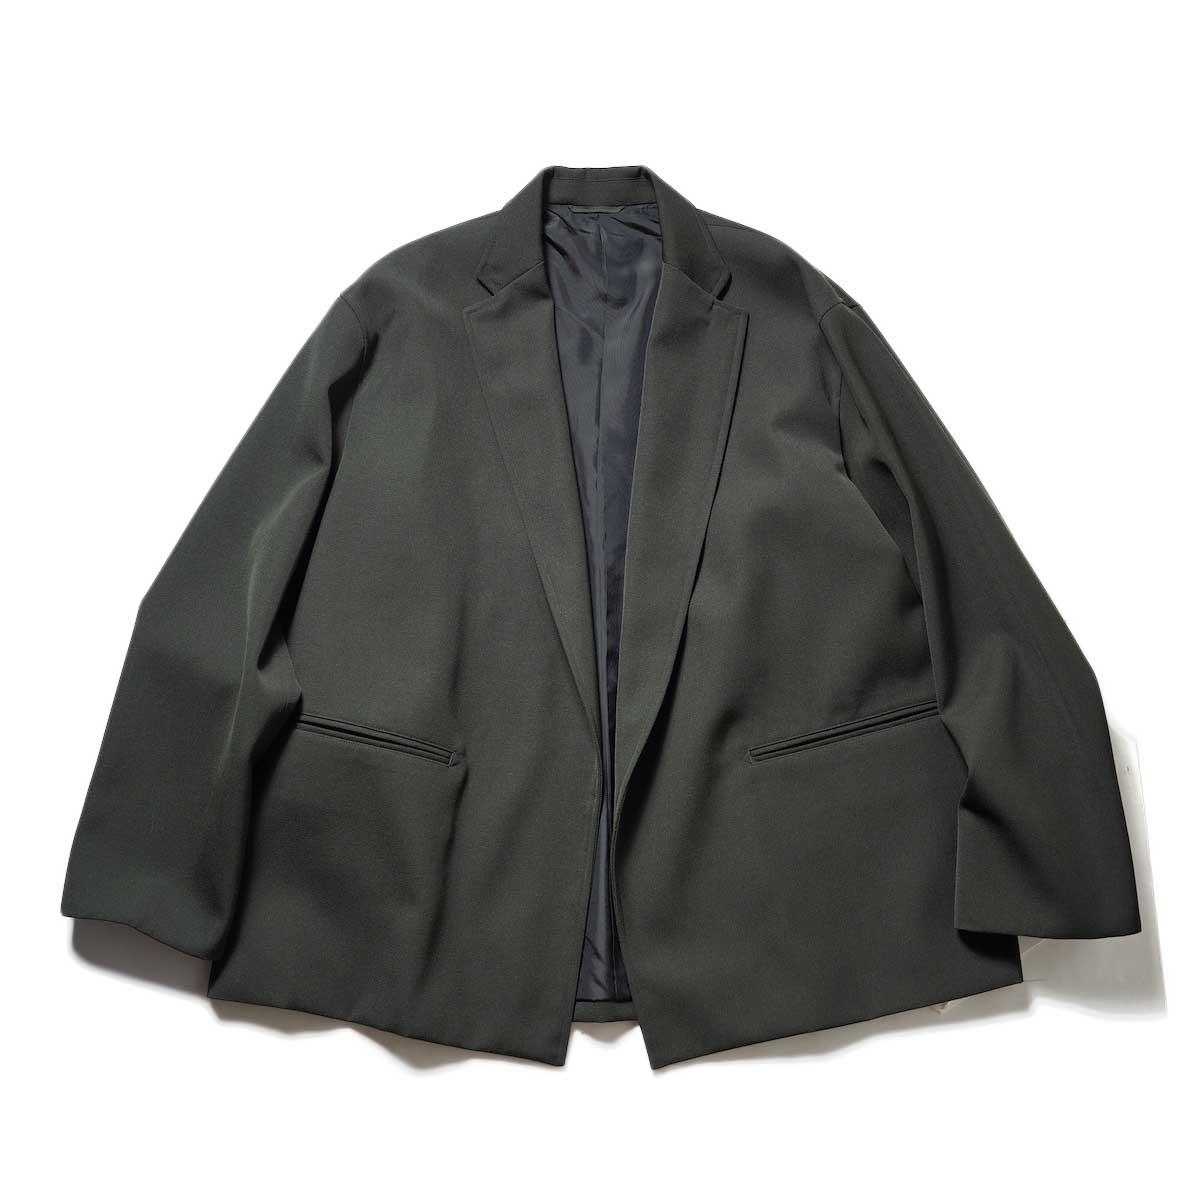 blurhms / Wool Surge Cardigan Jacket (Khaki Grey)正面